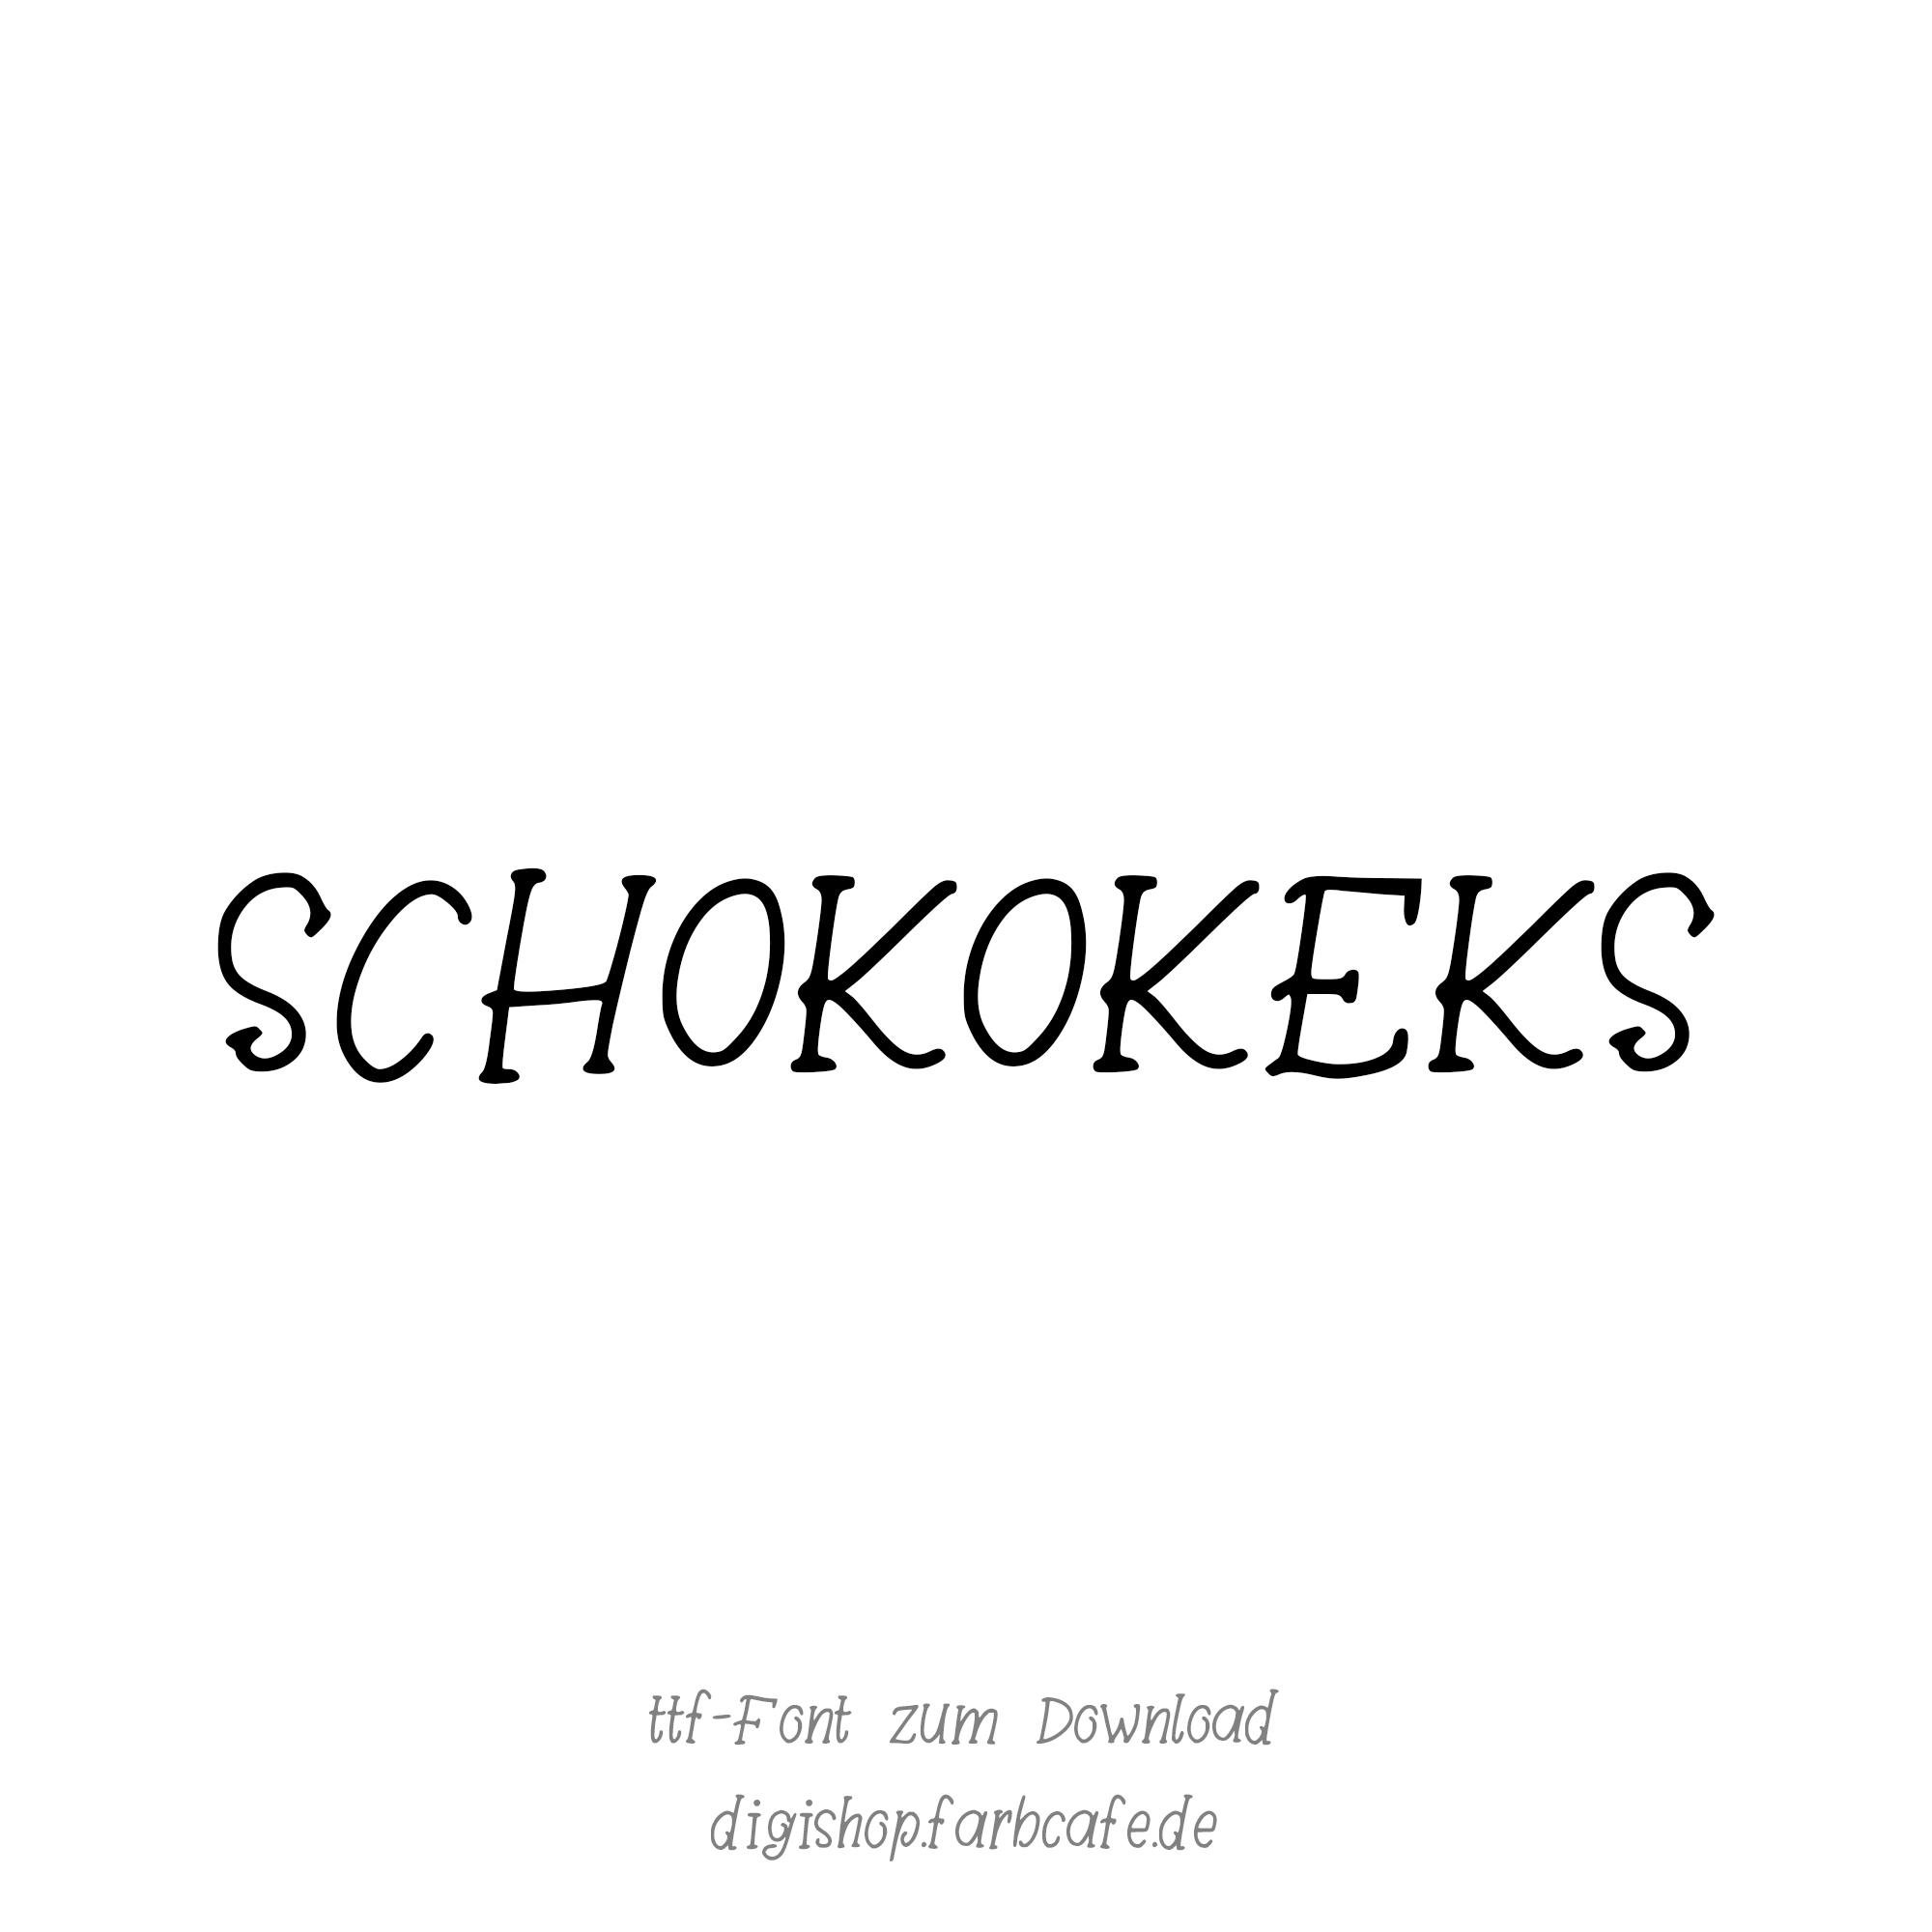 Schokokeks Handschrift-Font von Farbcafe.de